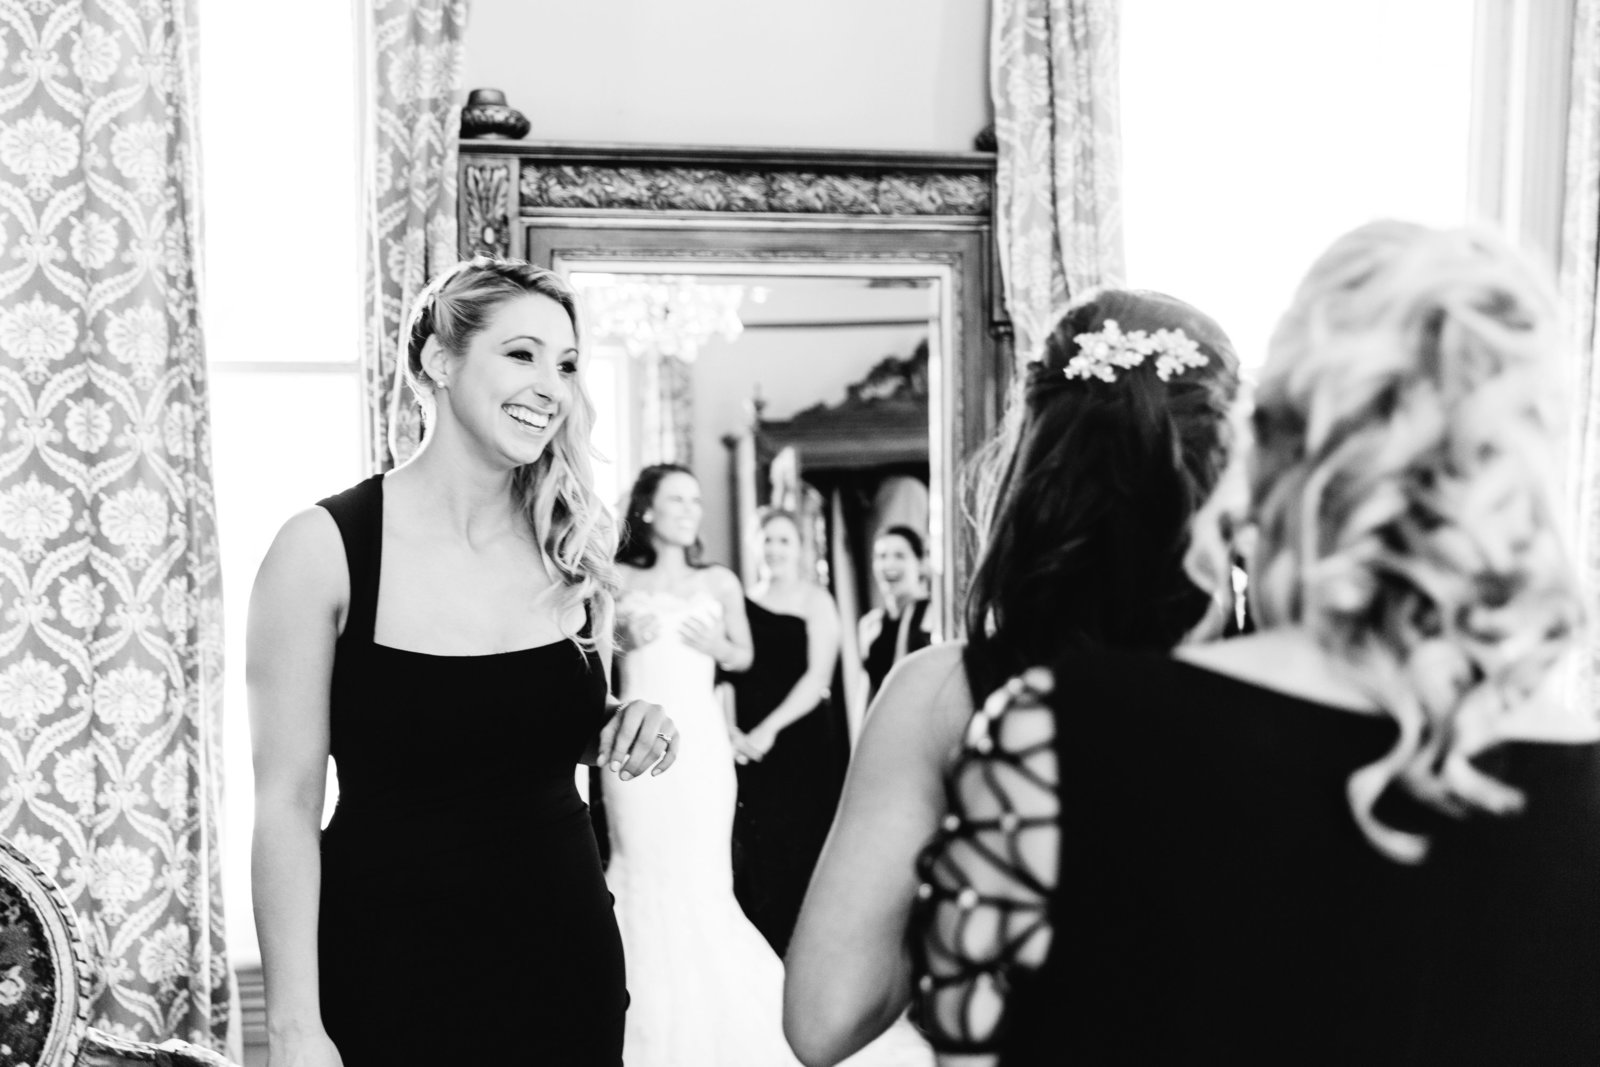 Wedding Photos-Jodee Debes Photography-247